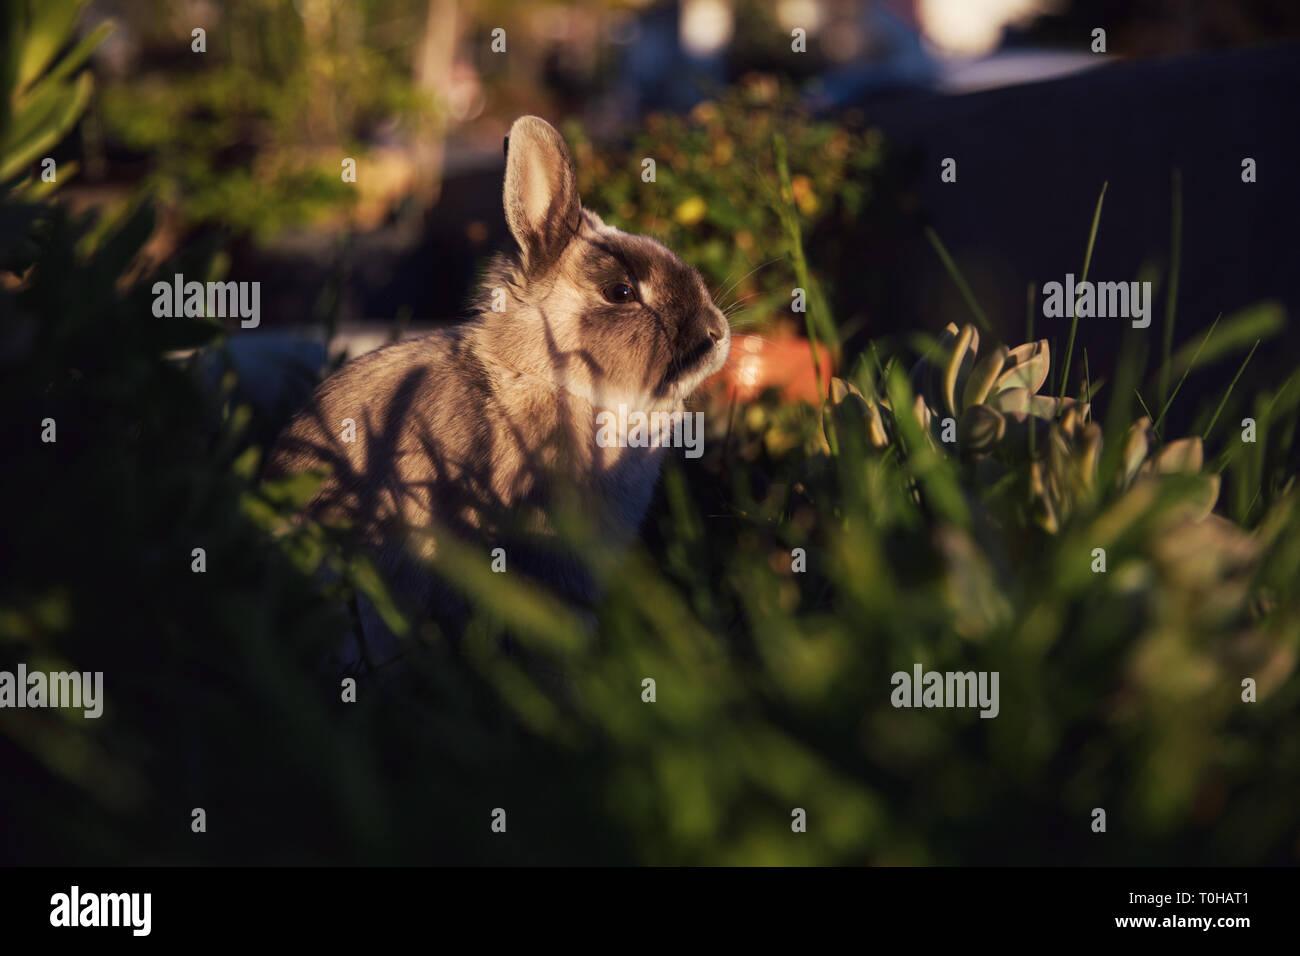 Un portrait d'un nain moody bunny basking dans la fin d'après-midi dans un jardin d'herbe. Banque D'Images